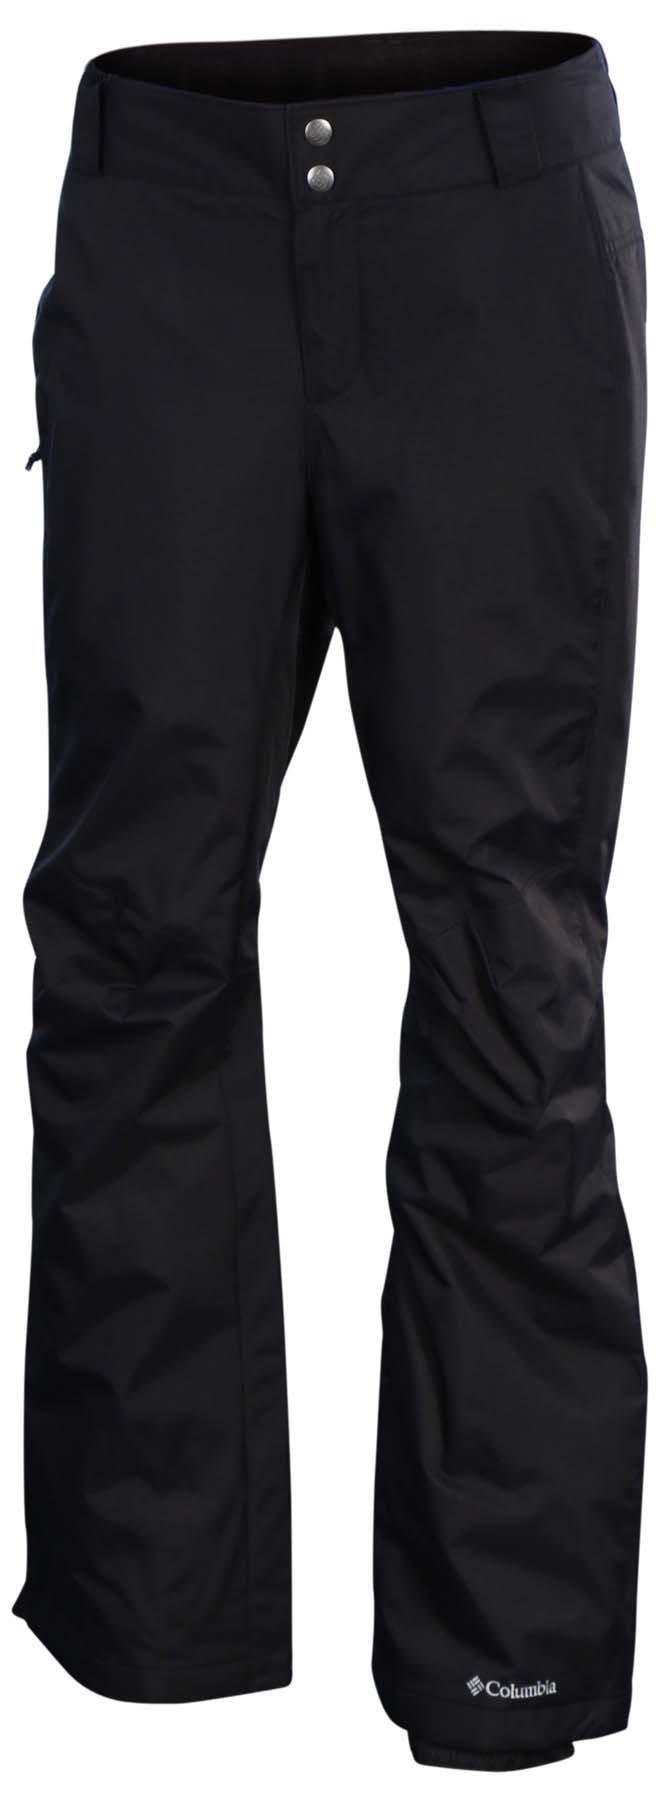 COLUMBIA Womens Arctic Trip Ski Snow Pants STYLE:XL8185-010 BLACK SHORT (LARGE SHORT)